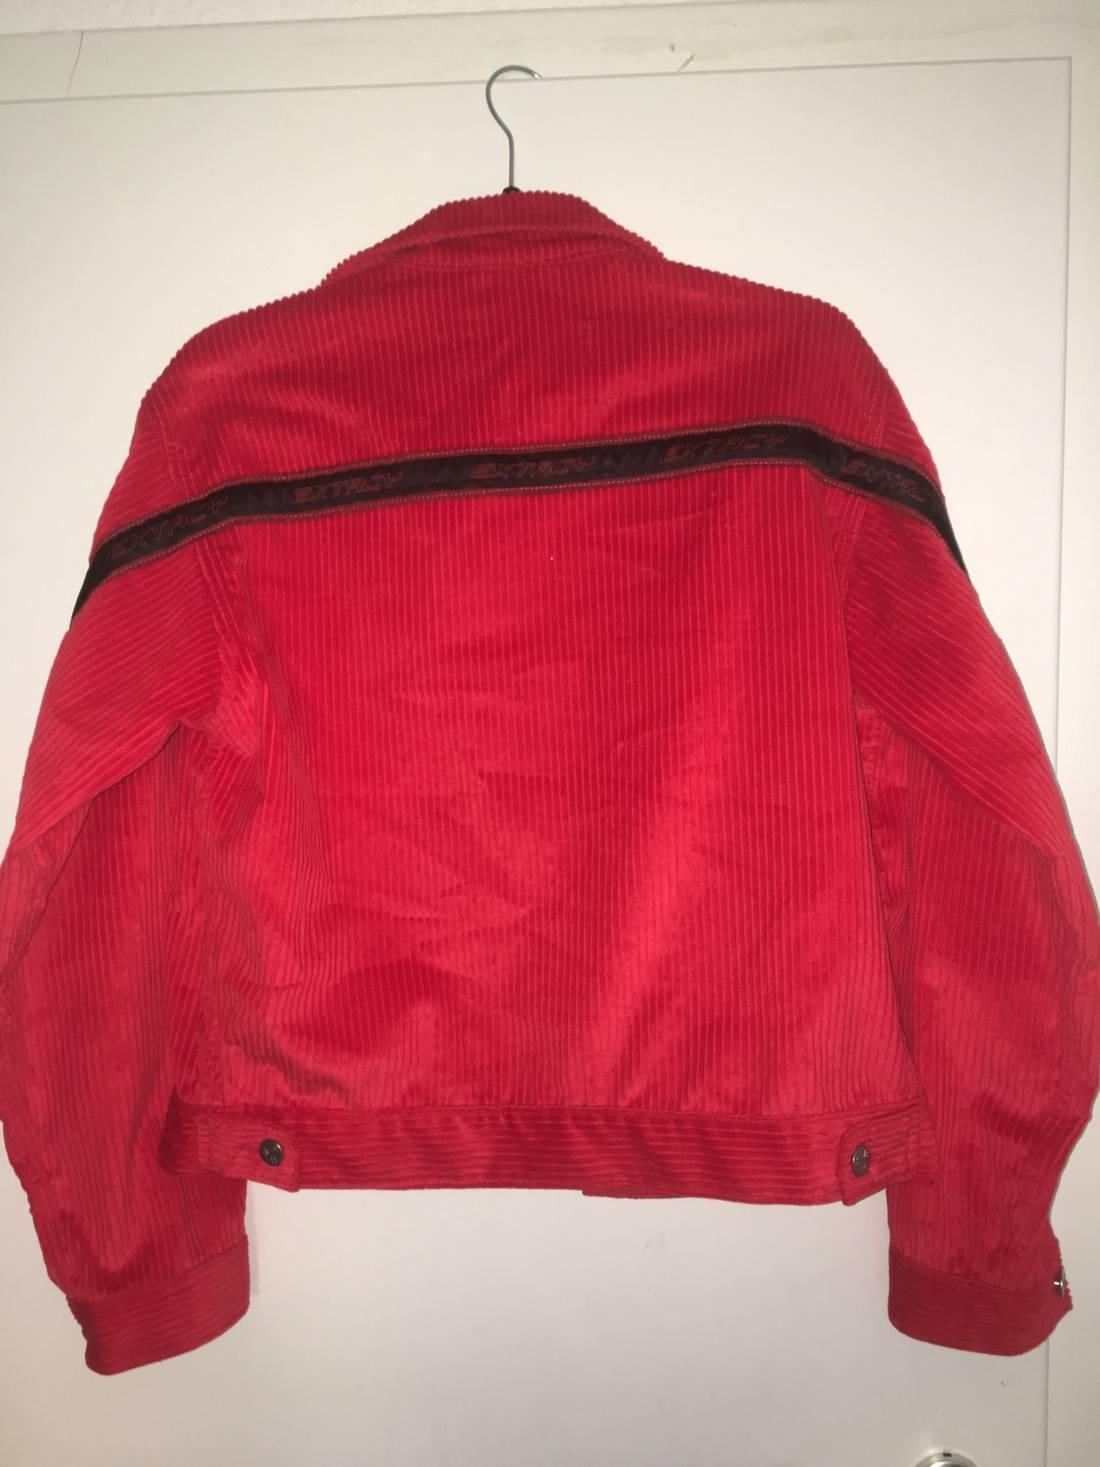 Misbhv last price drop brand new red extacy cordoroy trucker jacket misbhv last price drop brand new red extacy cordoroy trucker jacket size us m eu voltagebd Gallery